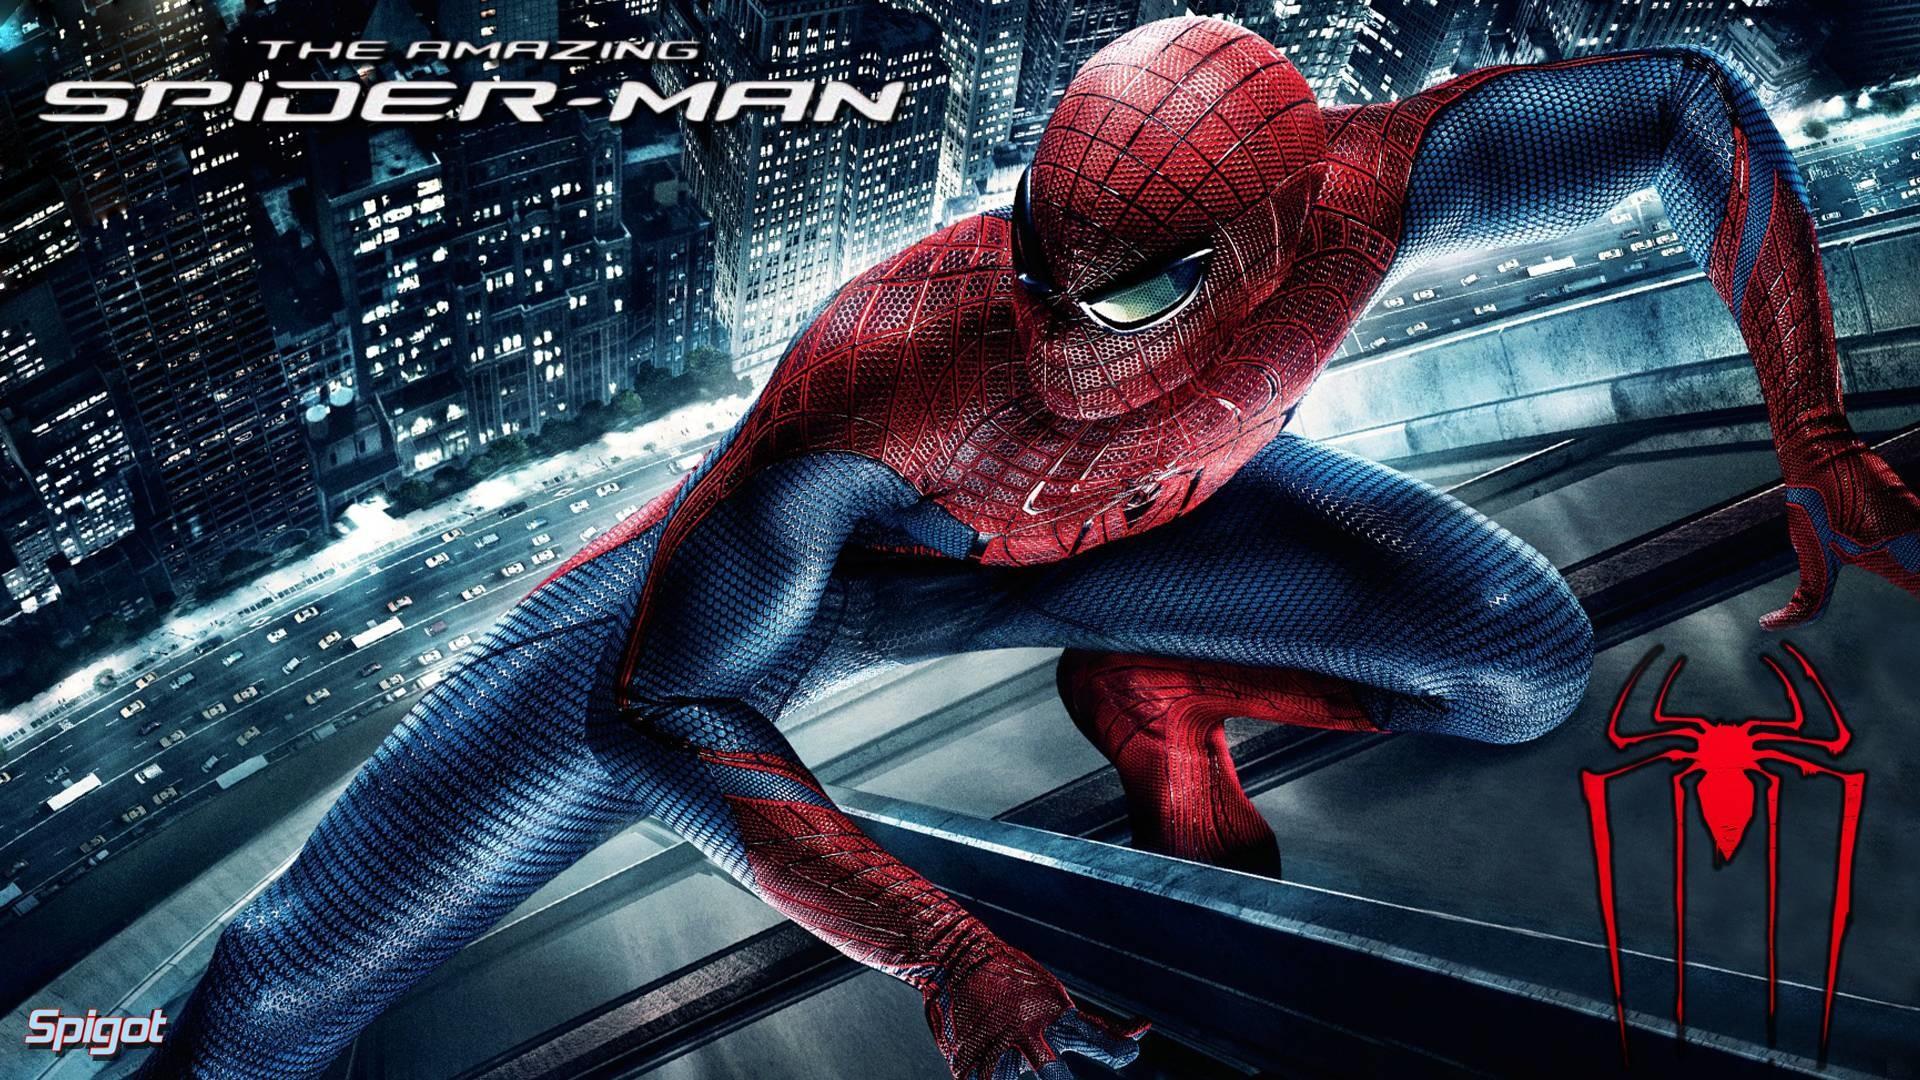 Spiderman Wallpapers HD Wallpaper | HD Wallpapers | Pinterest | Hd wallpaper  and Wallpaper